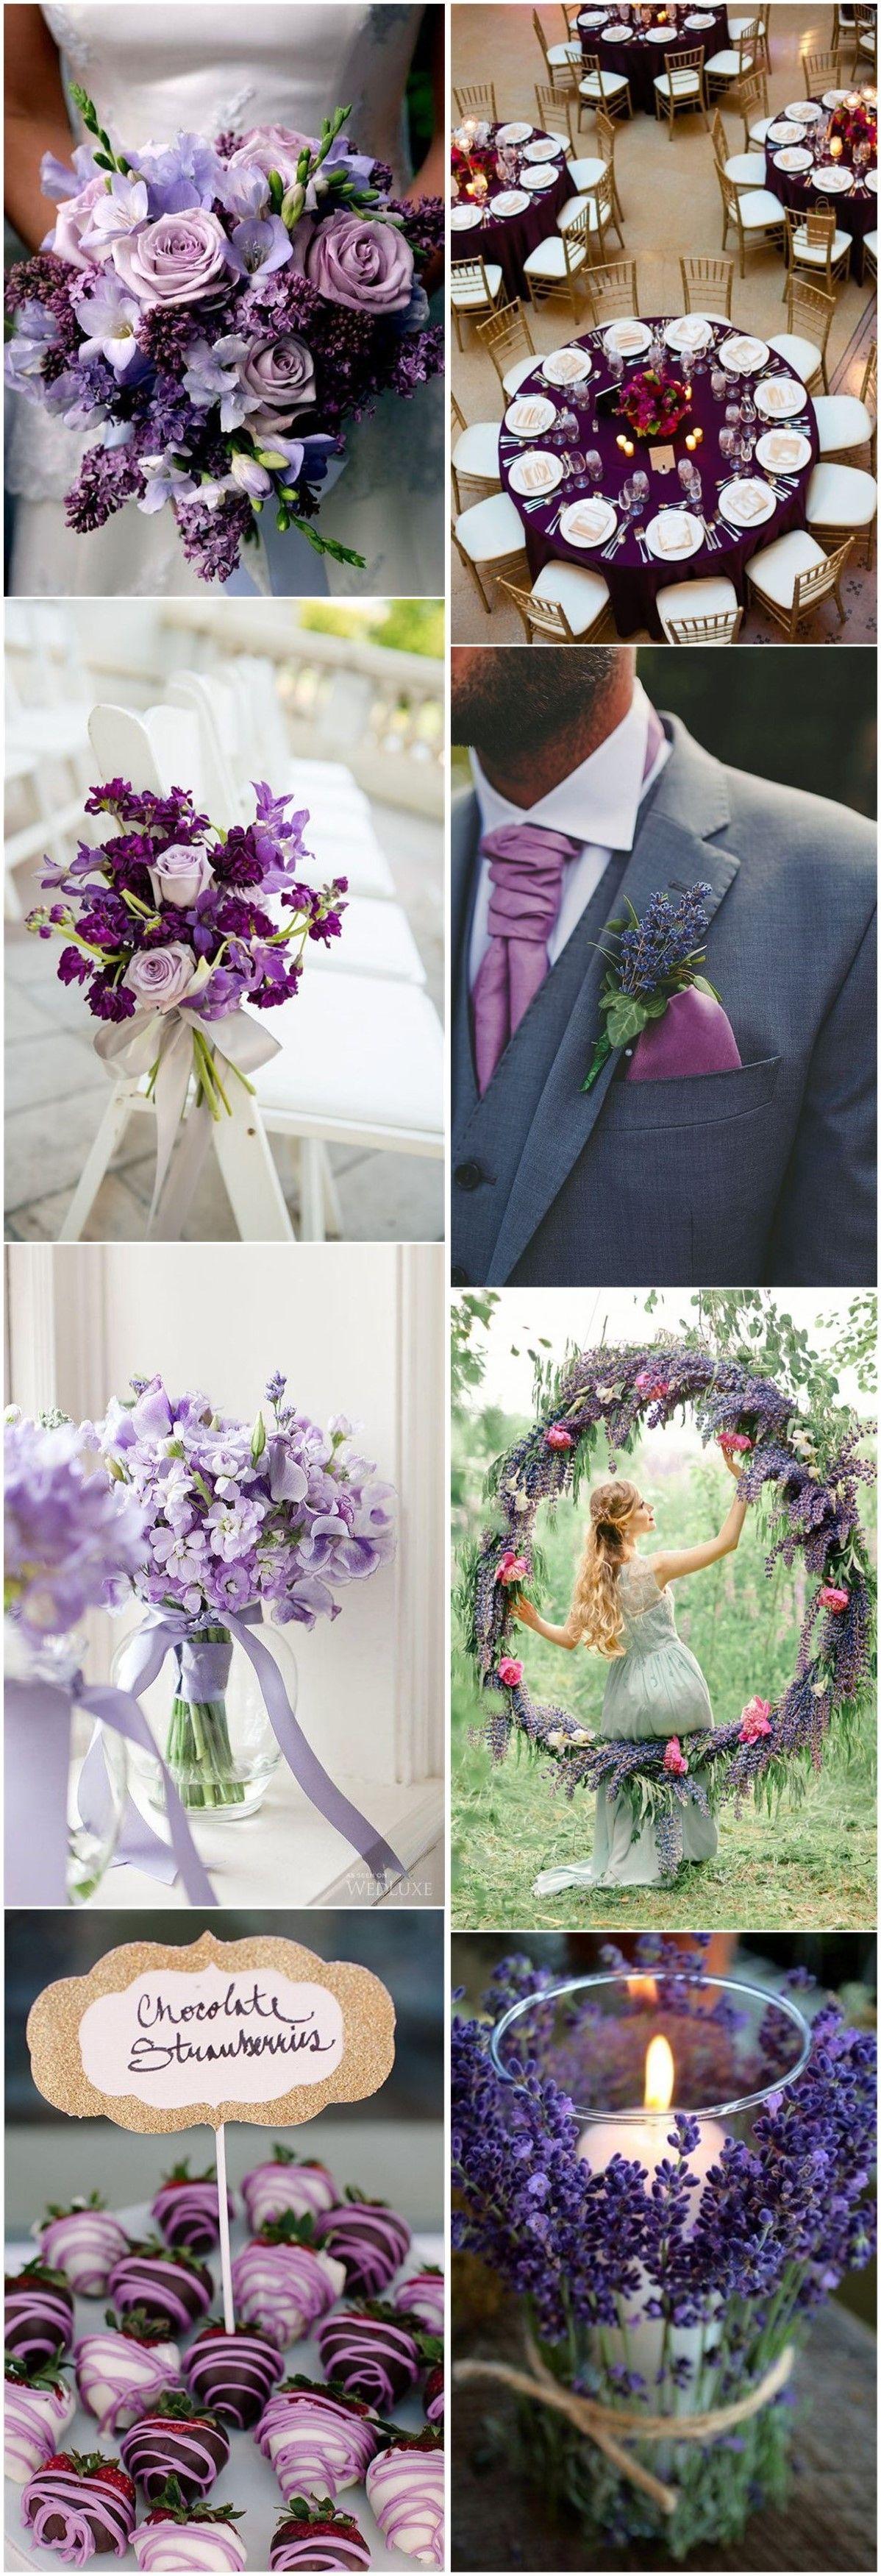 Fall wedding decor 2018  Color of    Violet Wedding Ideas You Canut Miss  Violets